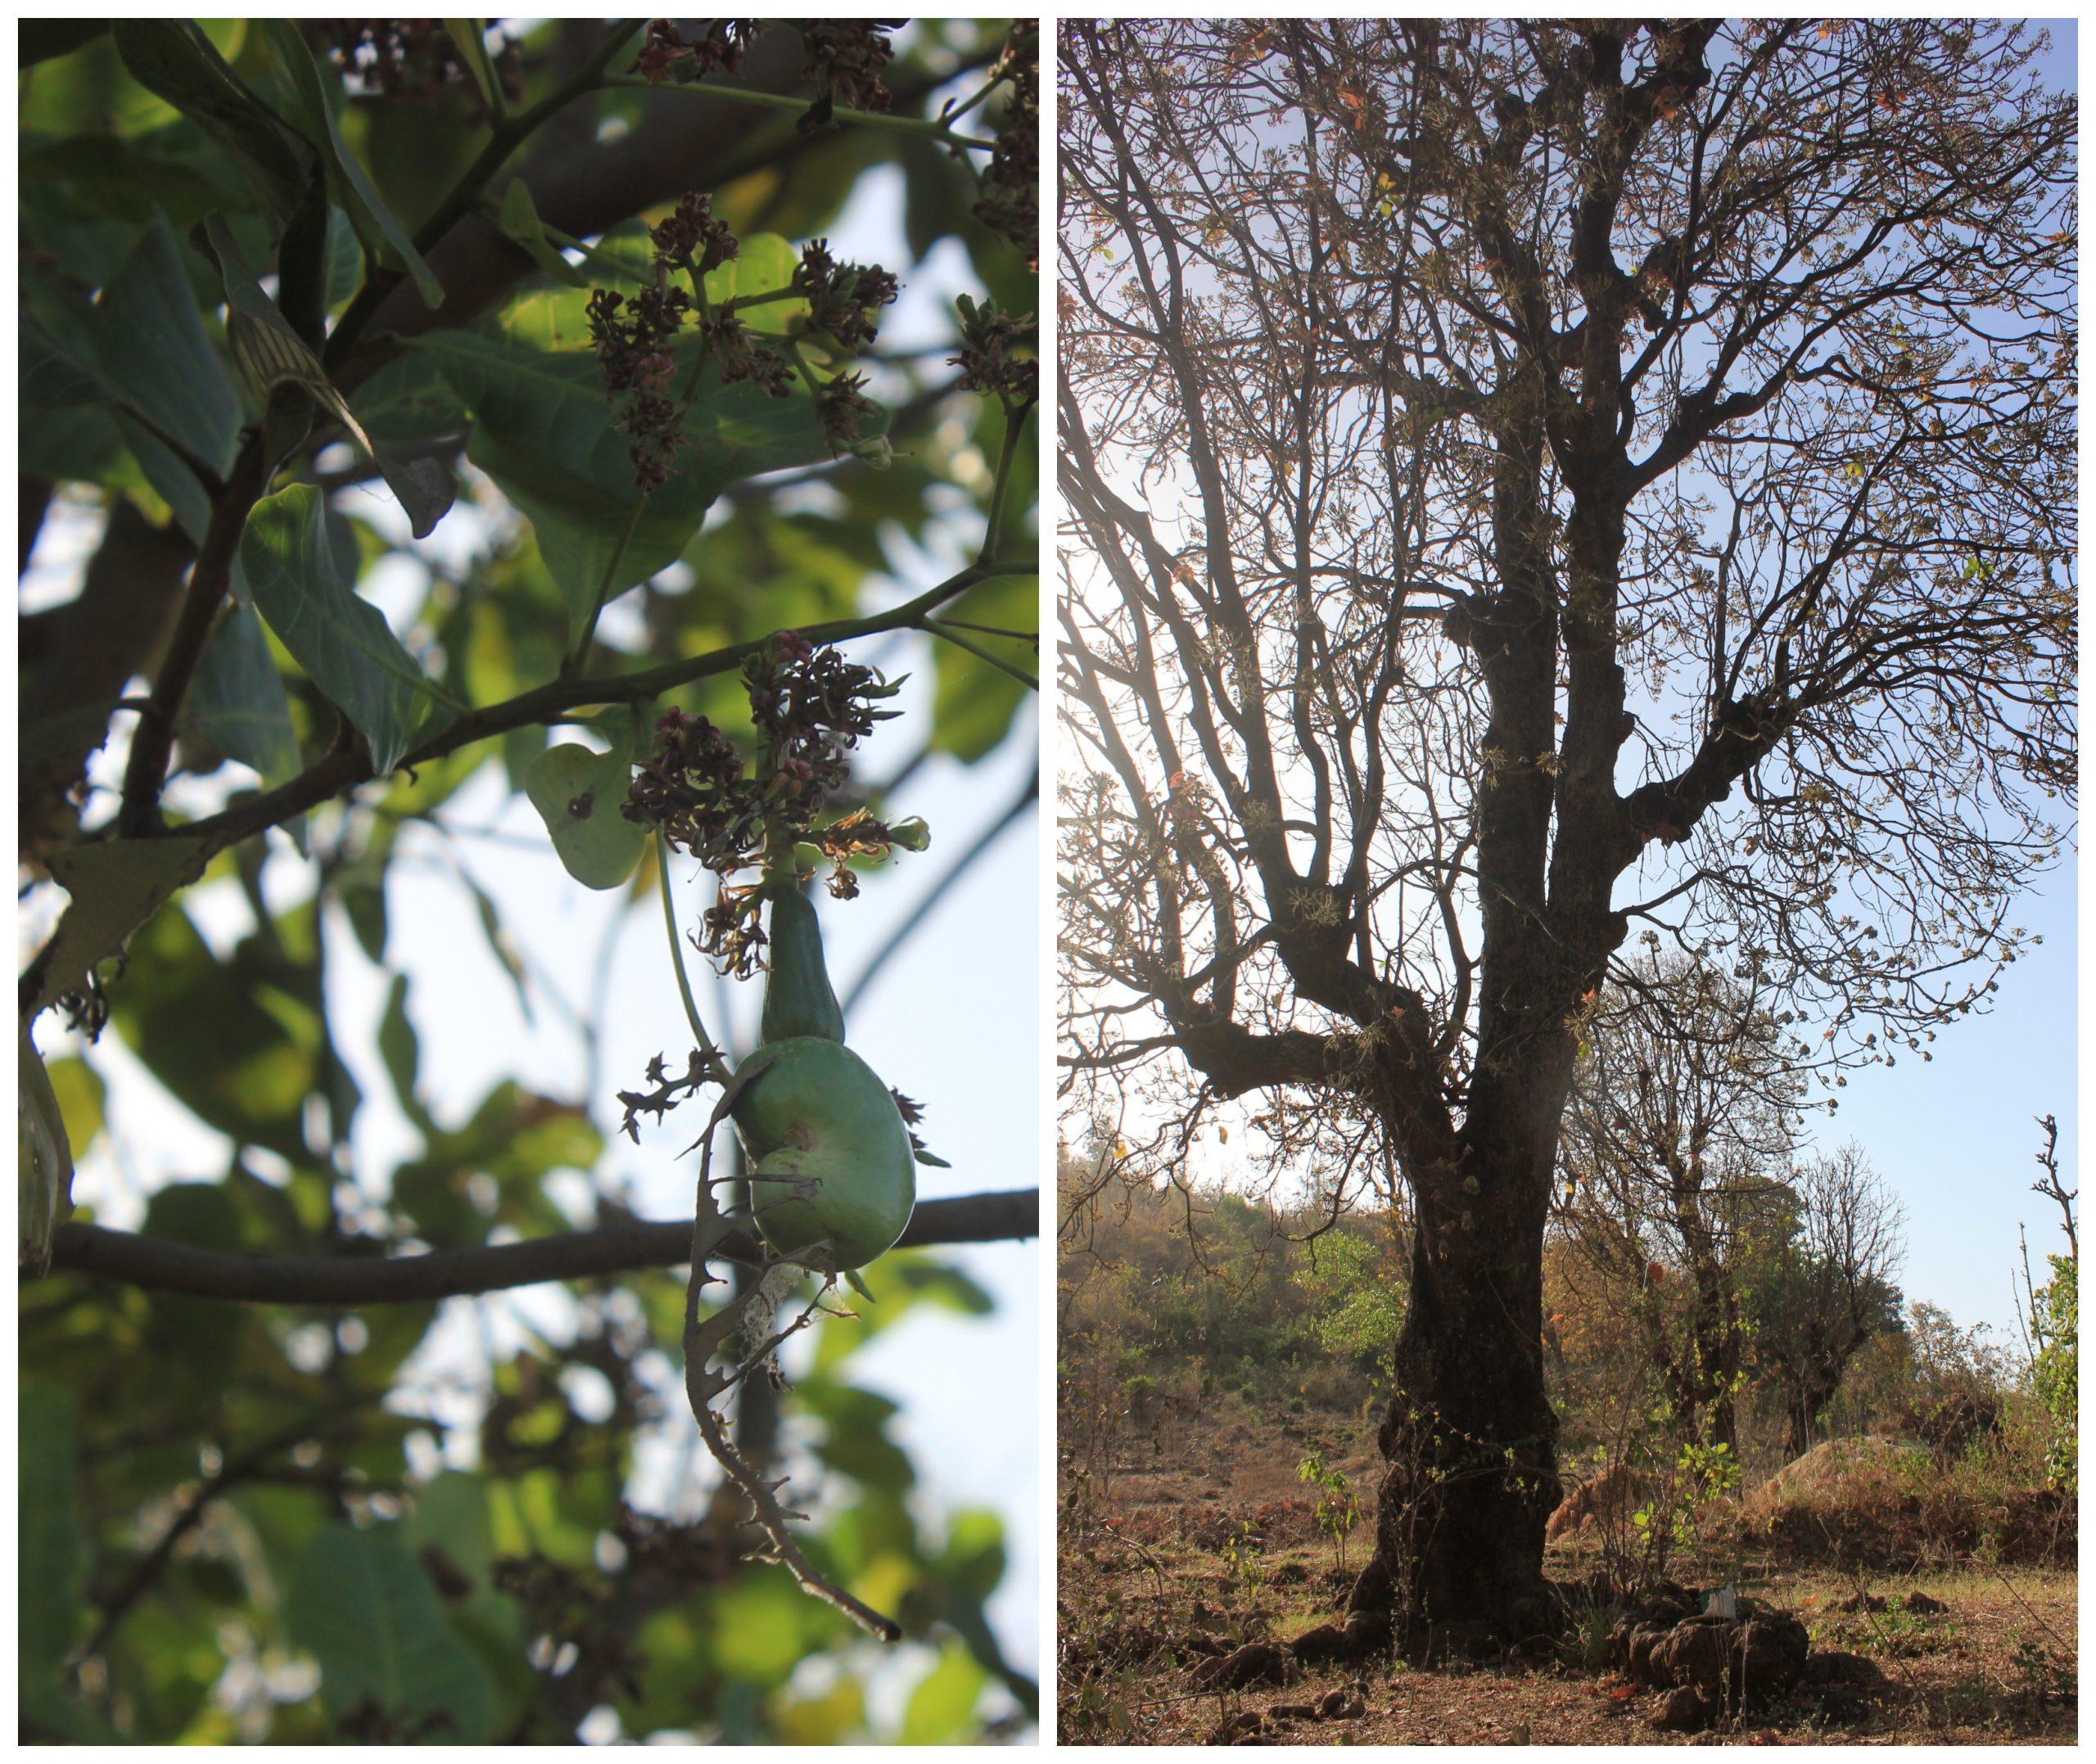 Photo 1_ The cashew and mahua tree in Premila Ben's home at Shamgahan, Dang.